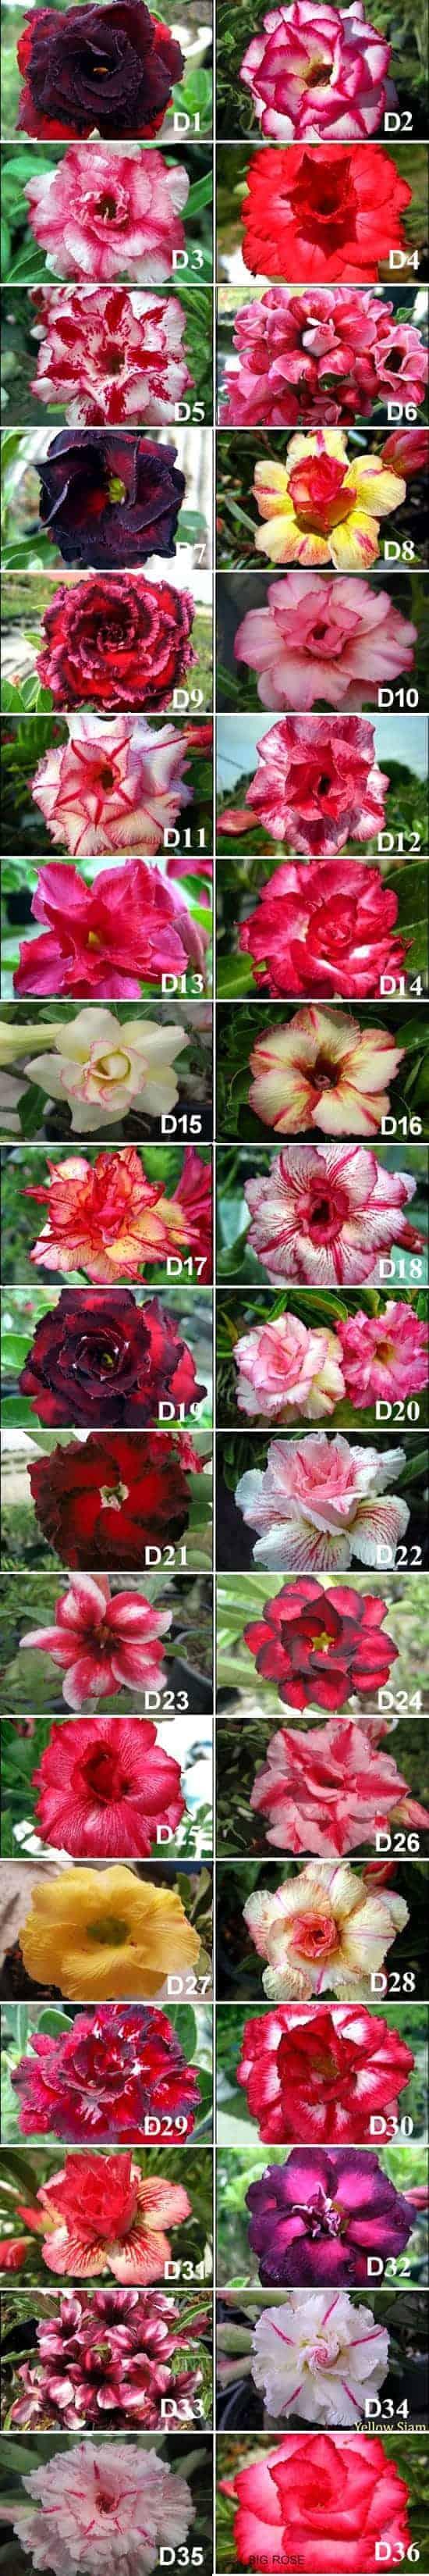 Adenium rosy flower group D